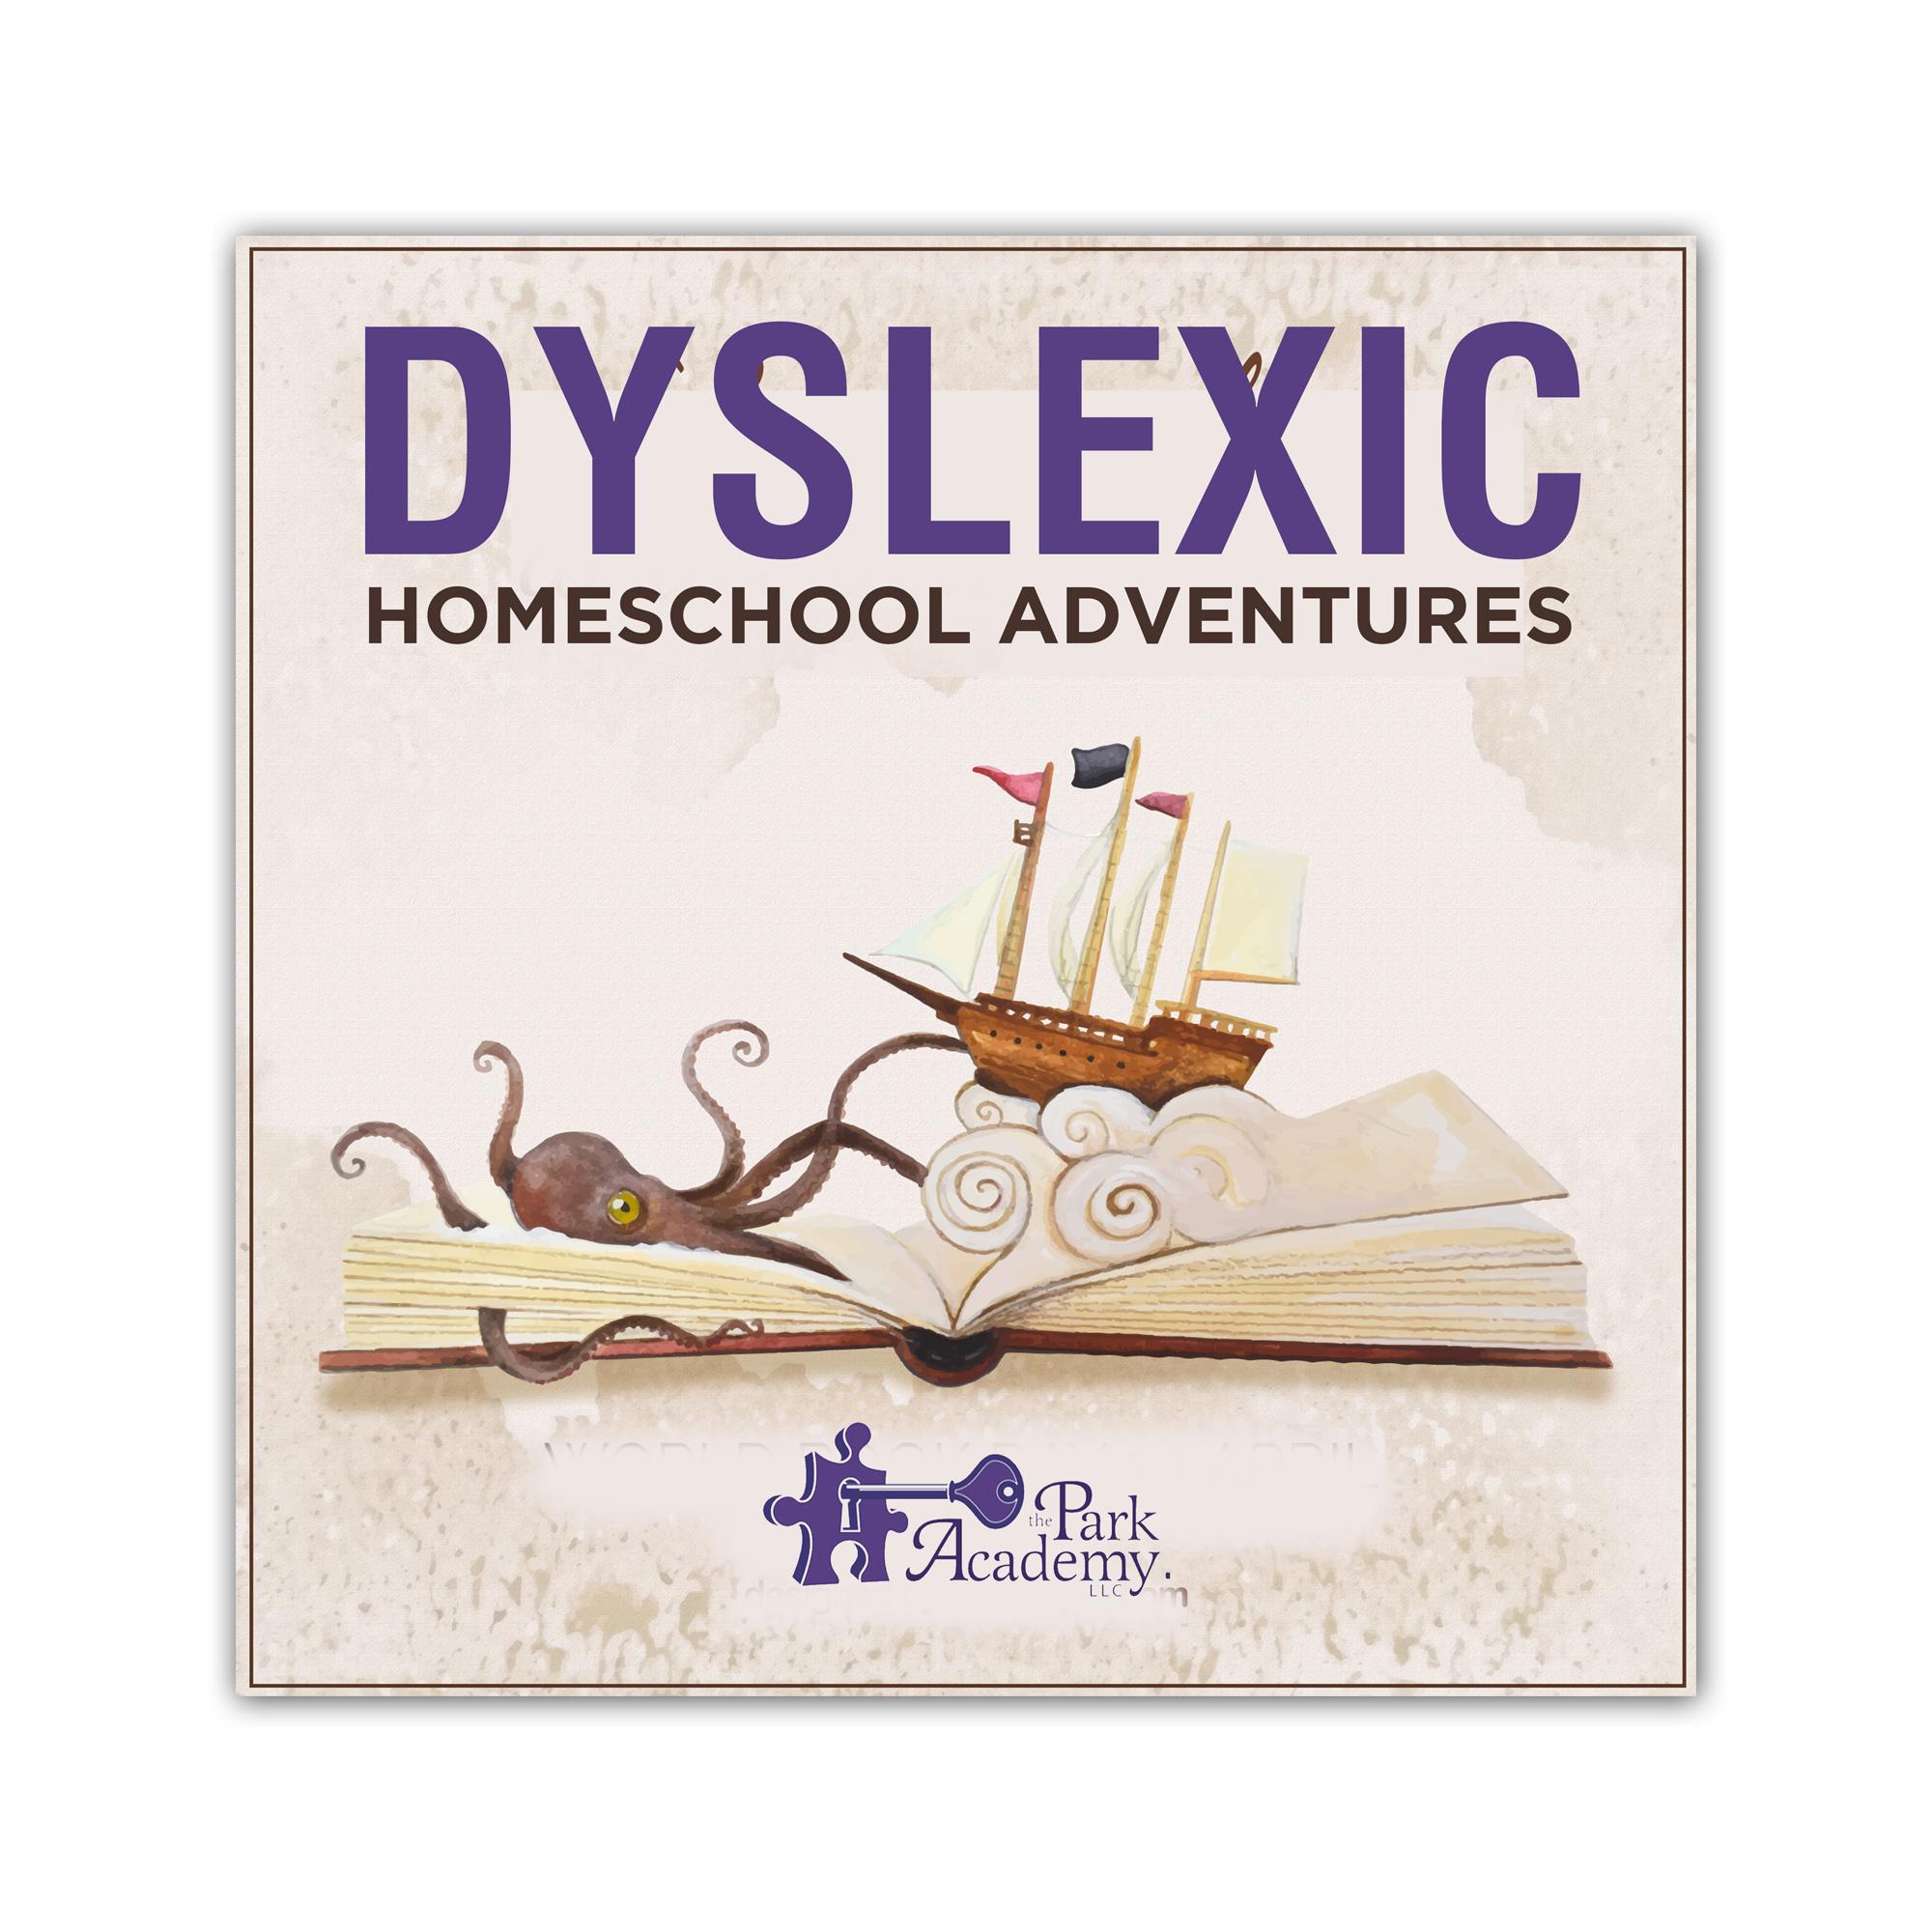 dyslexia homeschool adventures podcast